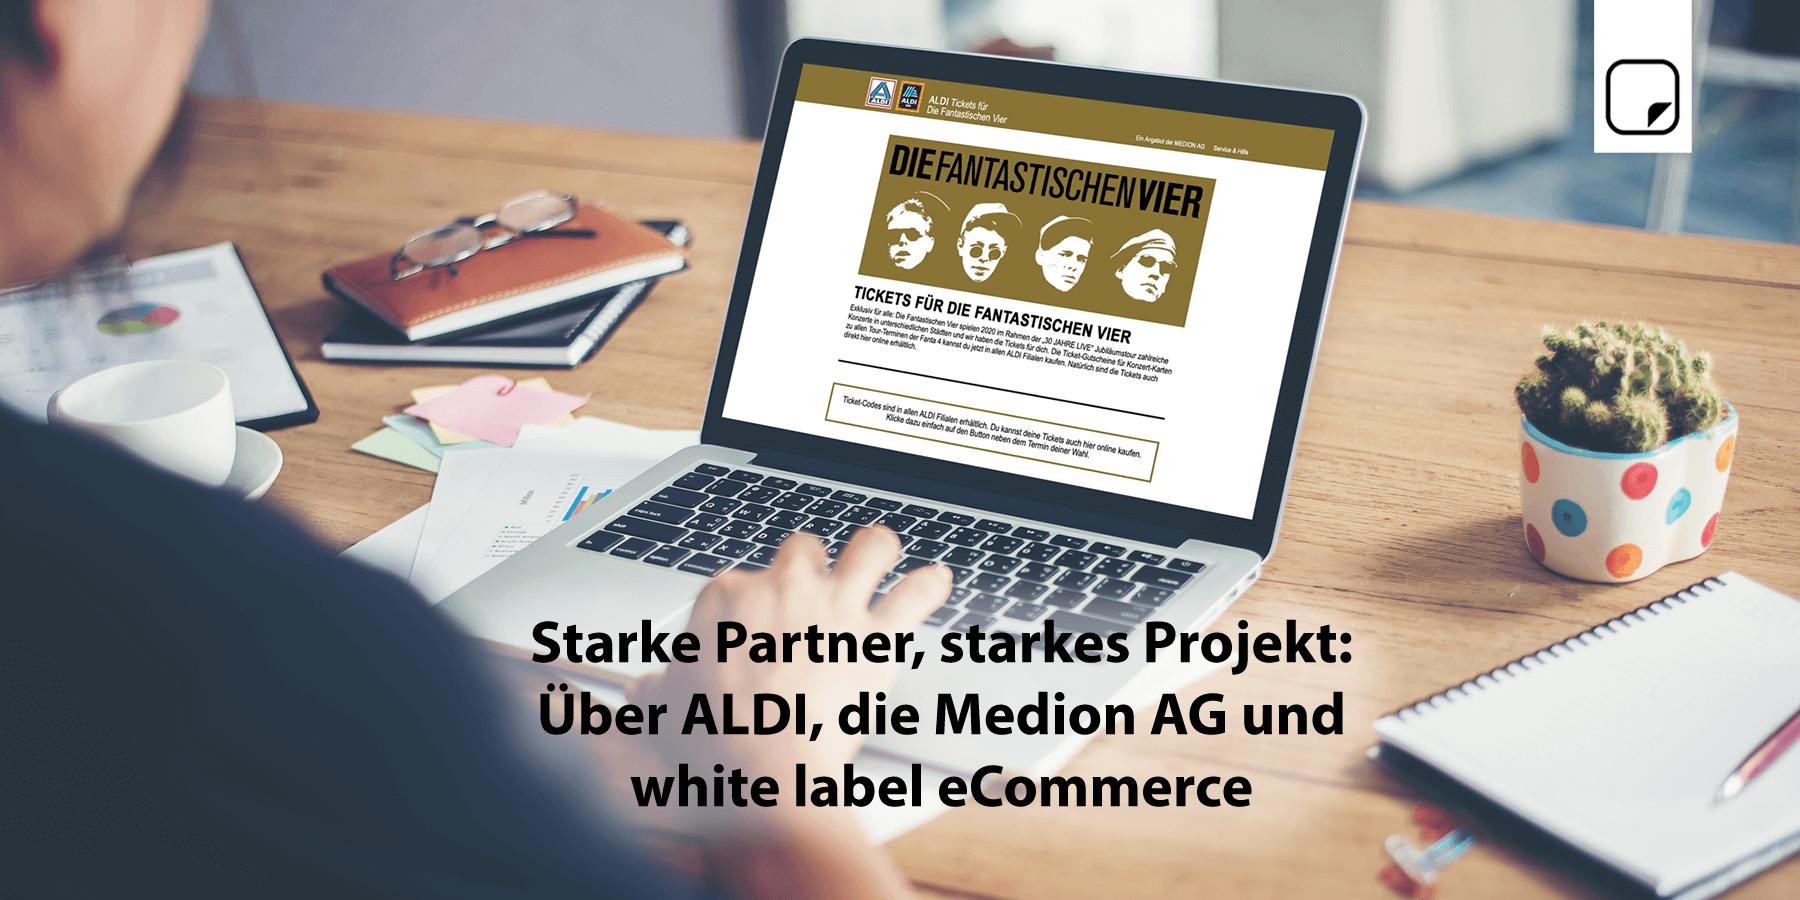 Starke Partner ALDI Medion wleC